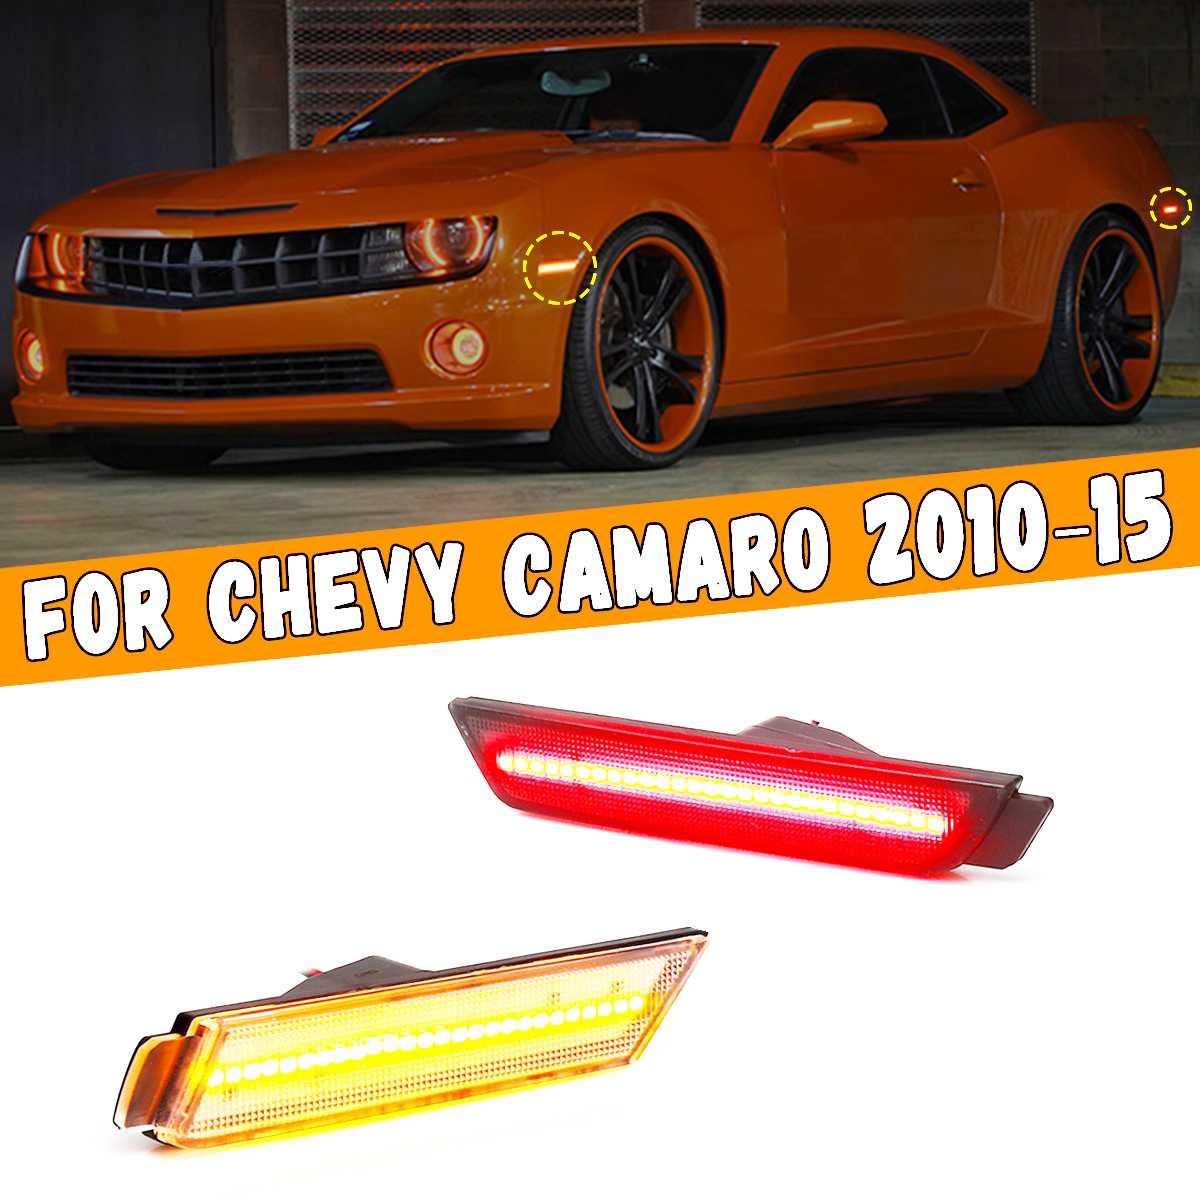 2010-15 Chevy Camaro Chrome Double Sided Key Ring